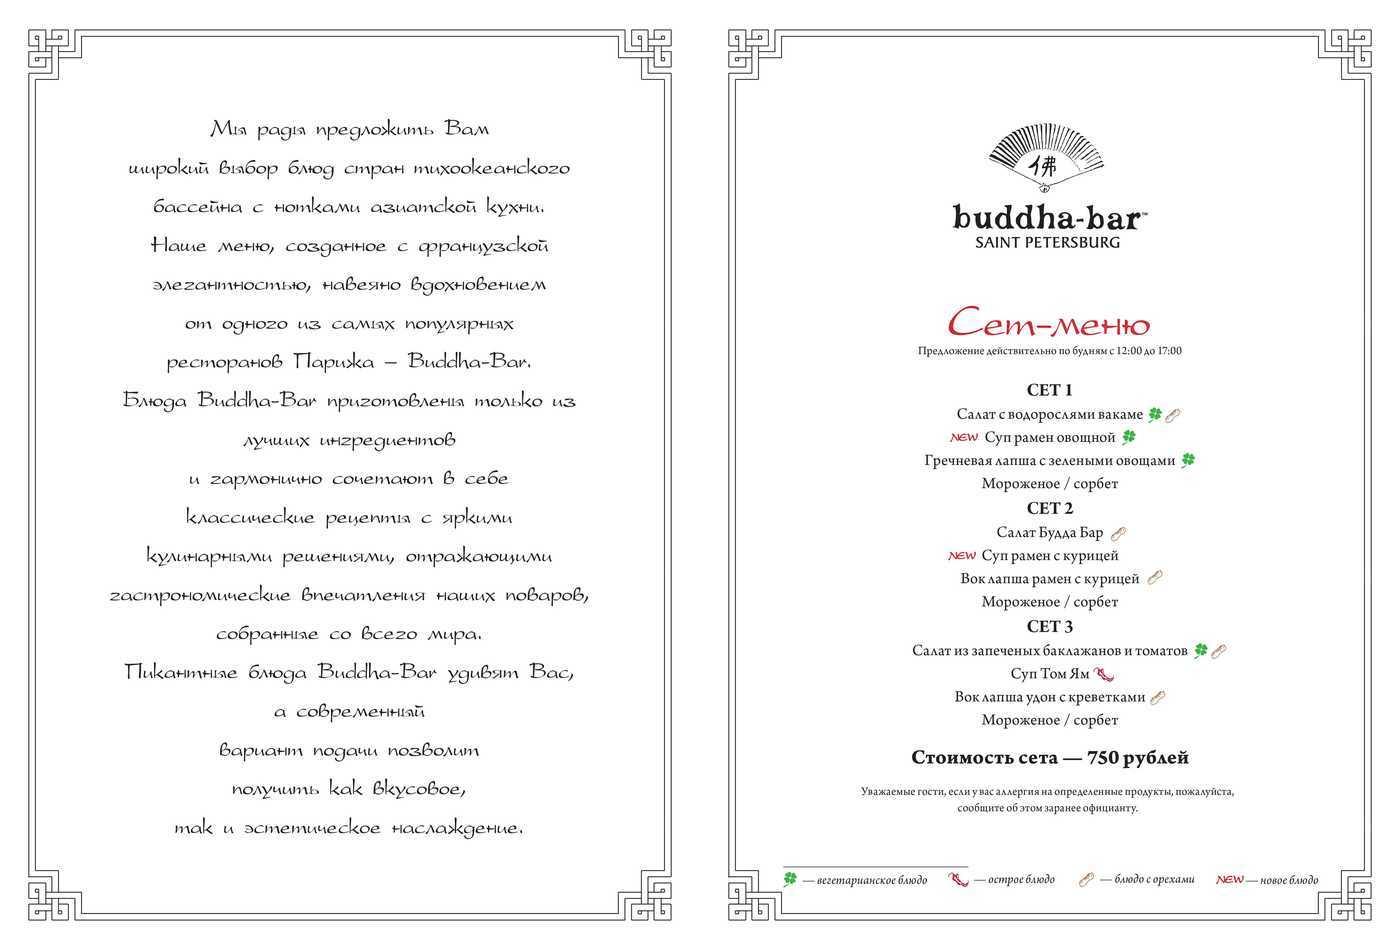 Меню ресторана Будда Бар (Buddha-Bar) на Синопской набережной фото 2